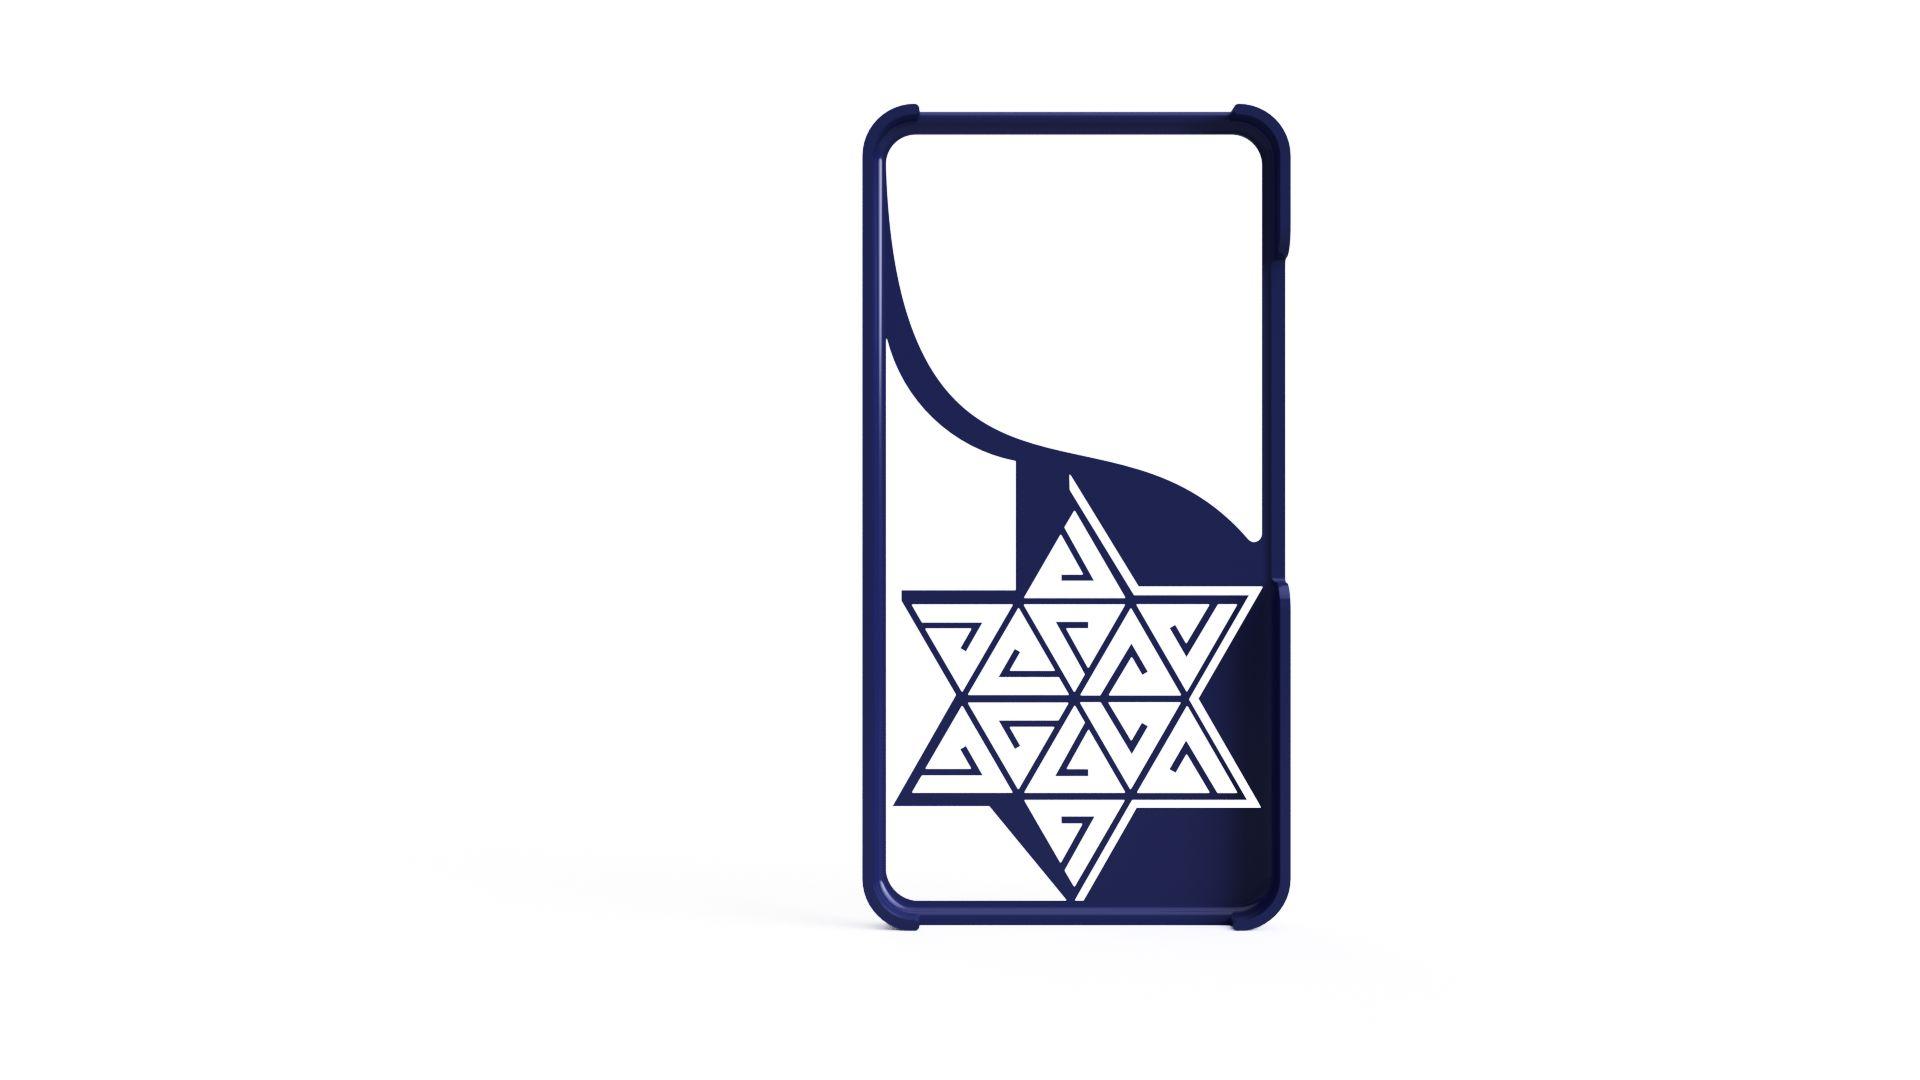 Pro---case-zenfone-3-asus-2017-feb-11-03-40-06pm-000-customizedview16667967801-3500-3500